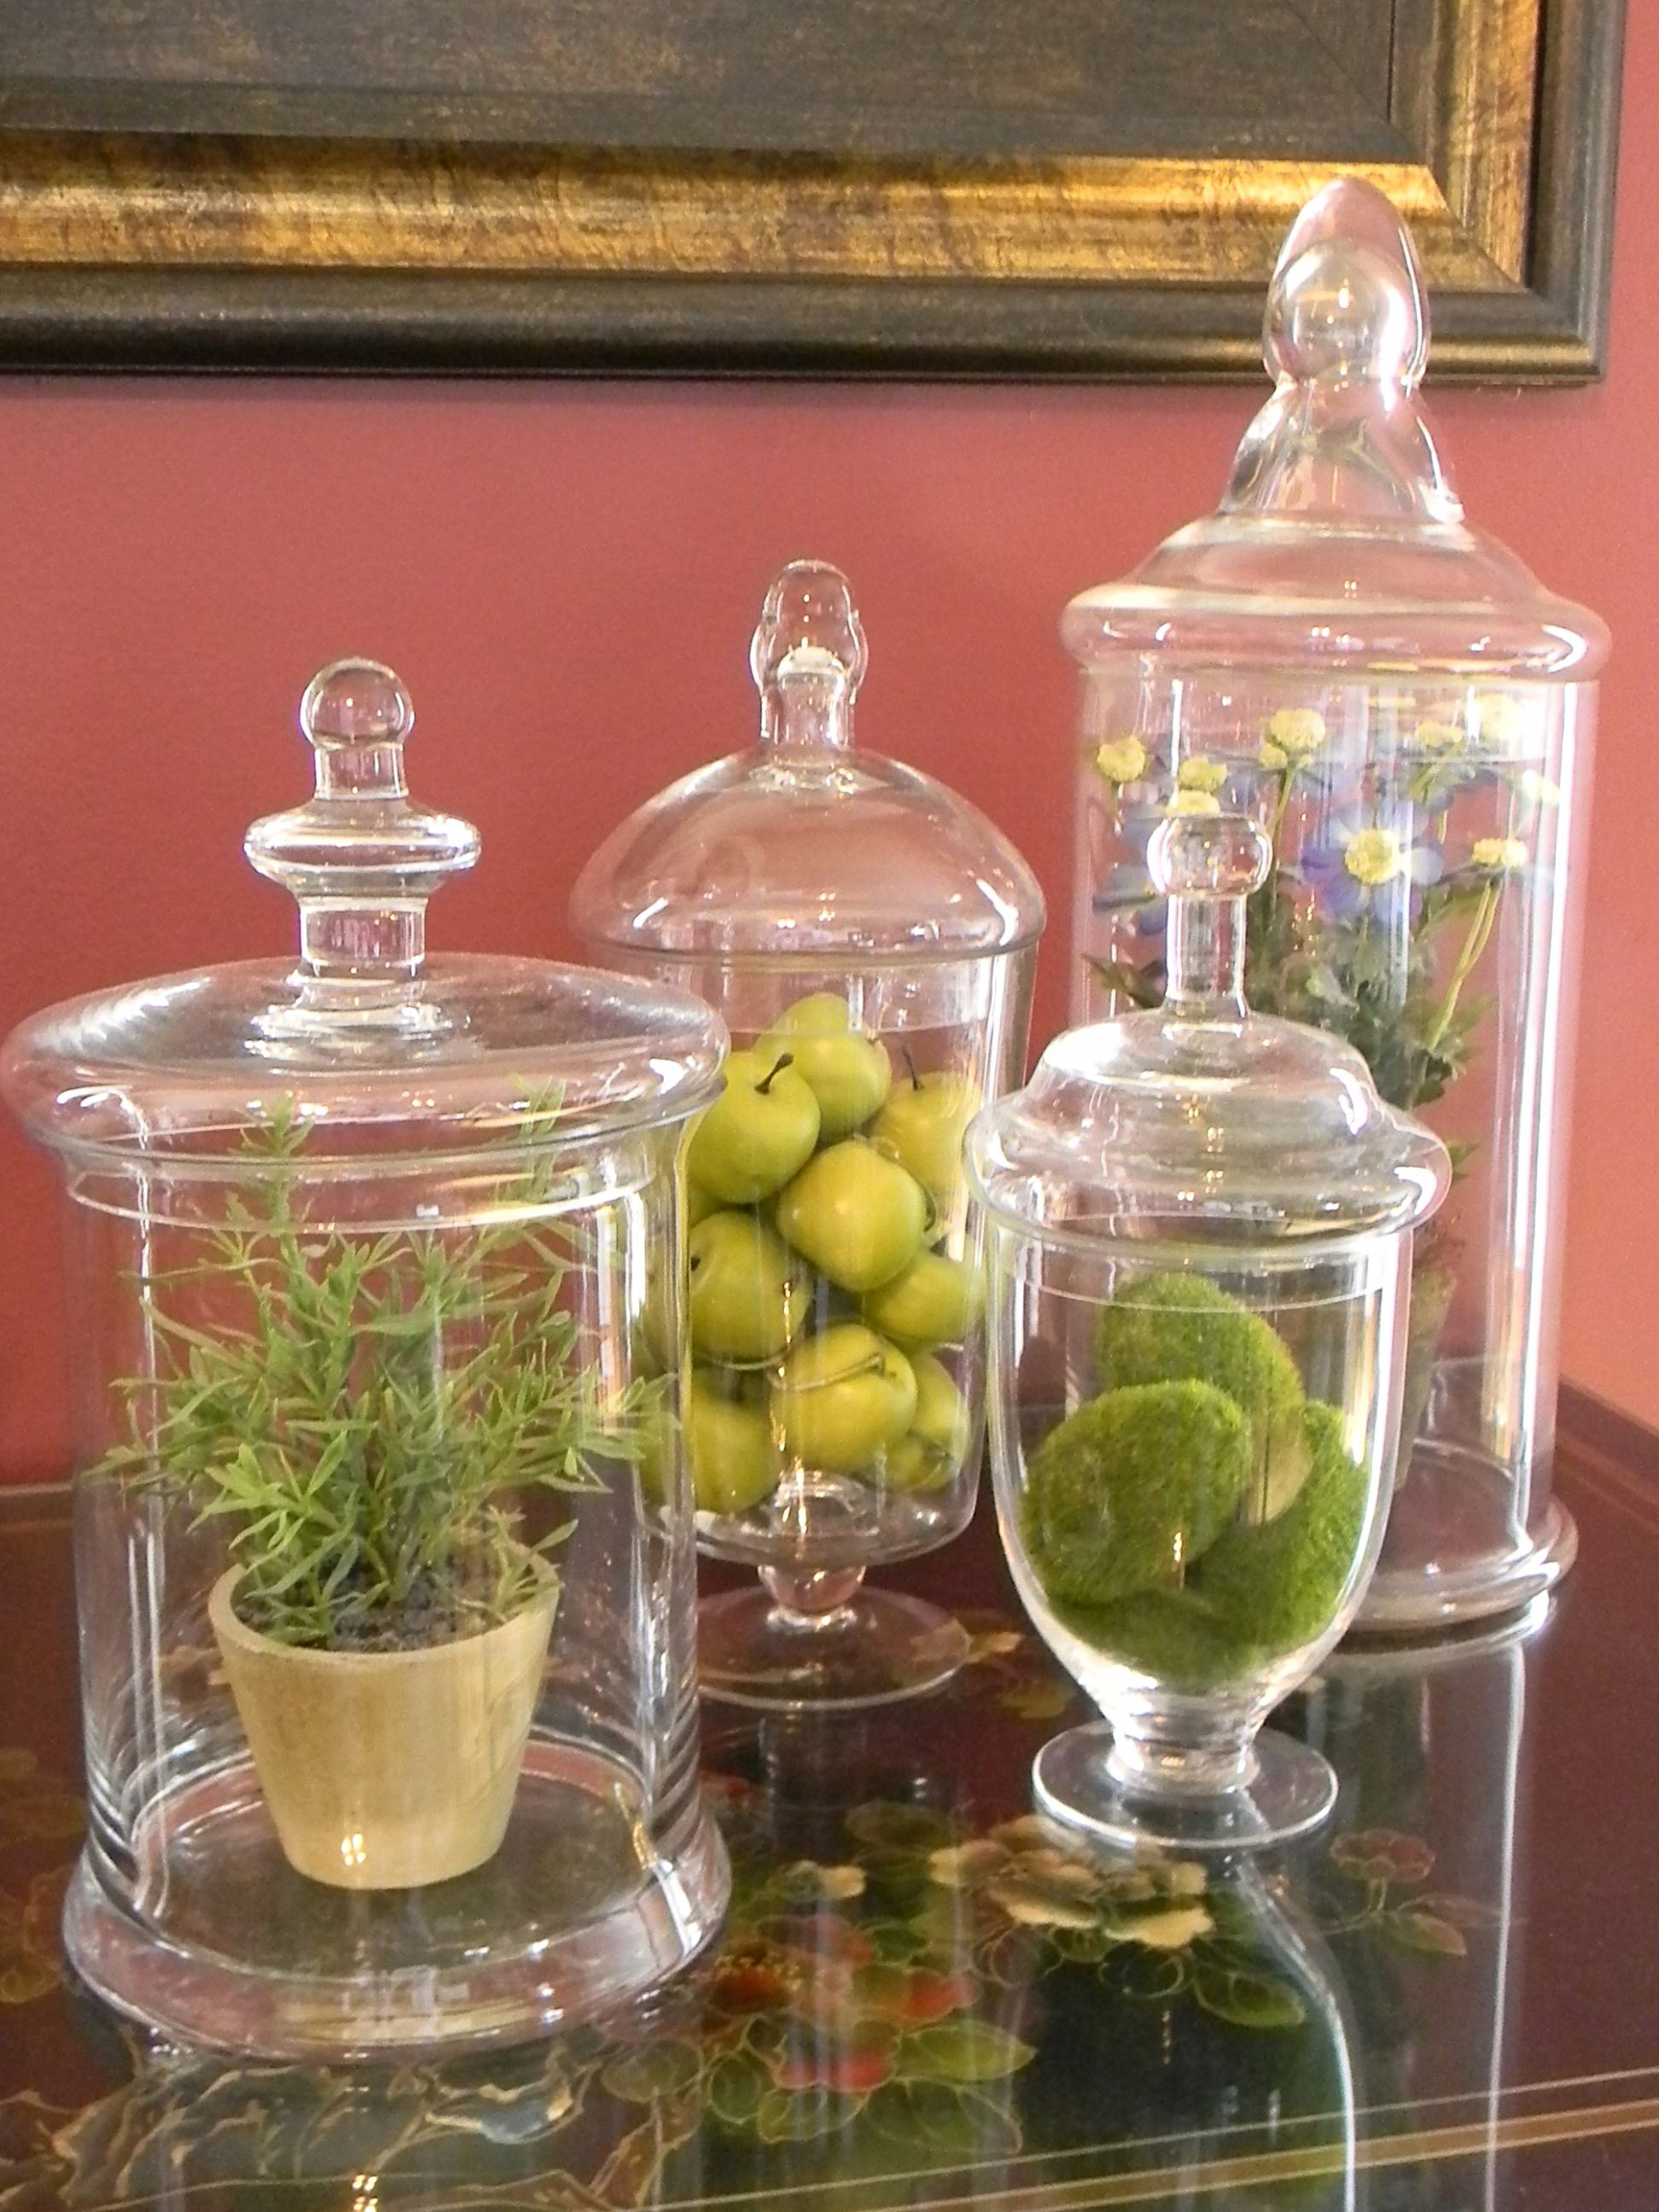 Touches Of Spring Apothecary Jars Kitchen Apothecary Jars Decor Apothecary Decor